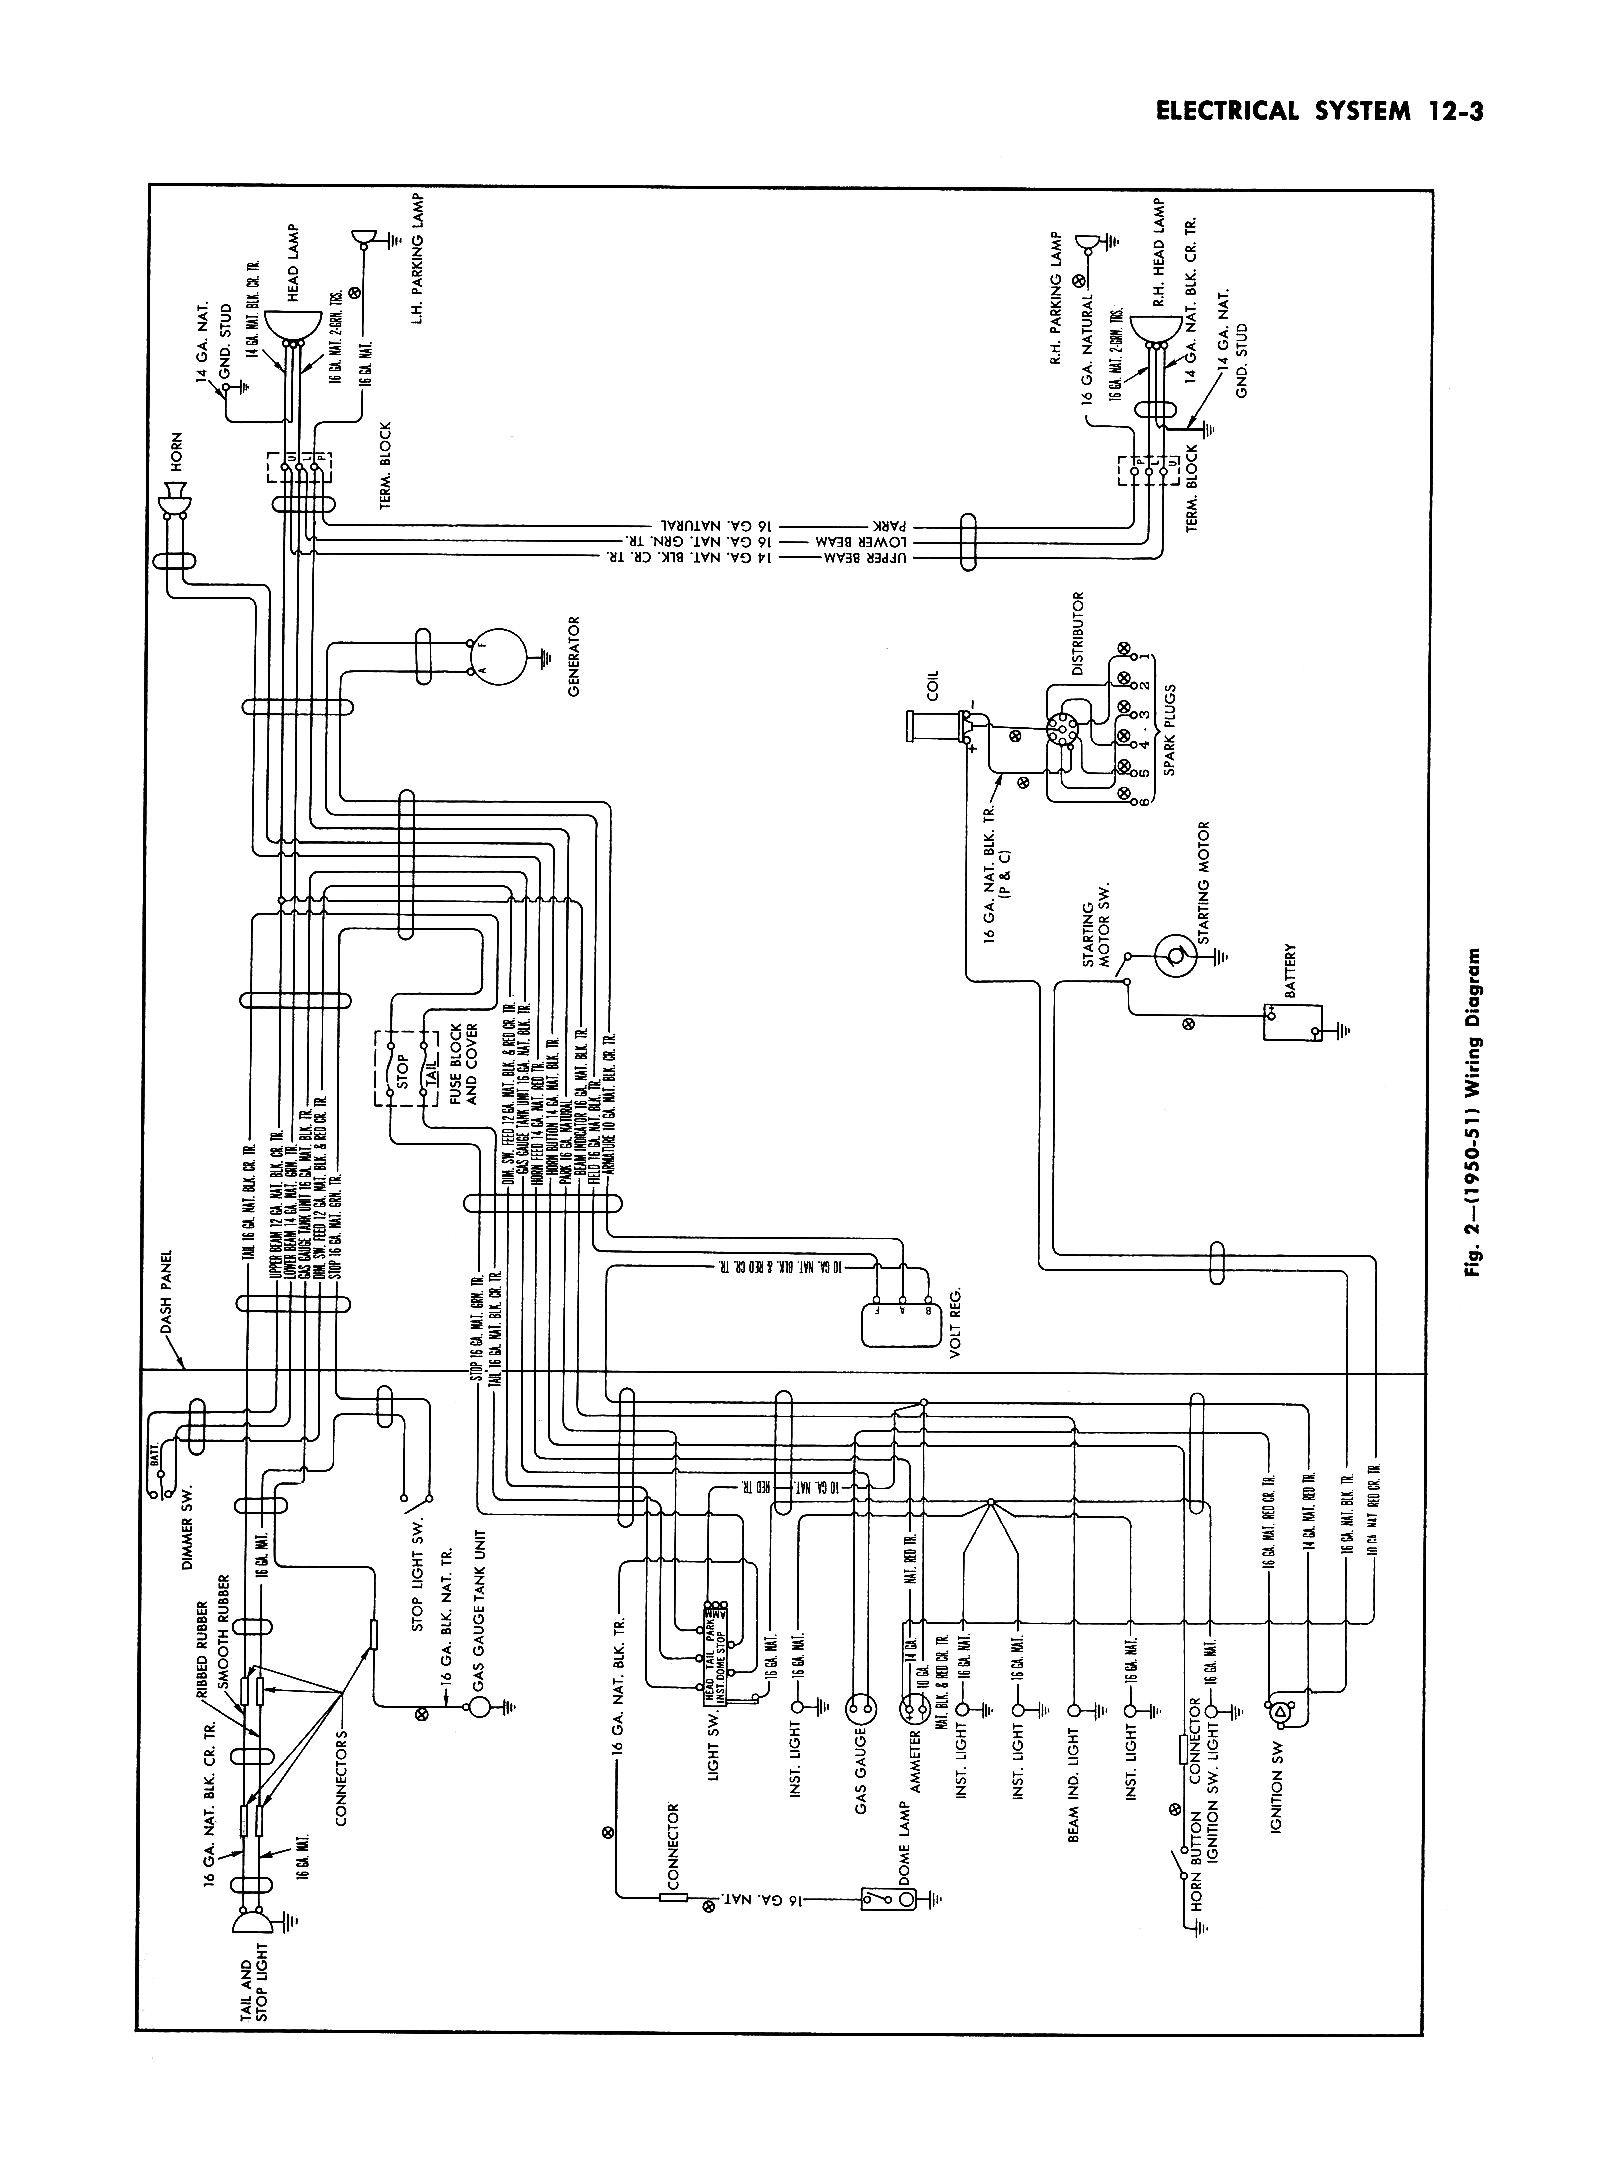 medium resolution of 1953 mercury wiring diagram wiring diagram week1953 lincoln wiring diagram wiring diagram technic 1953 mercury wiring